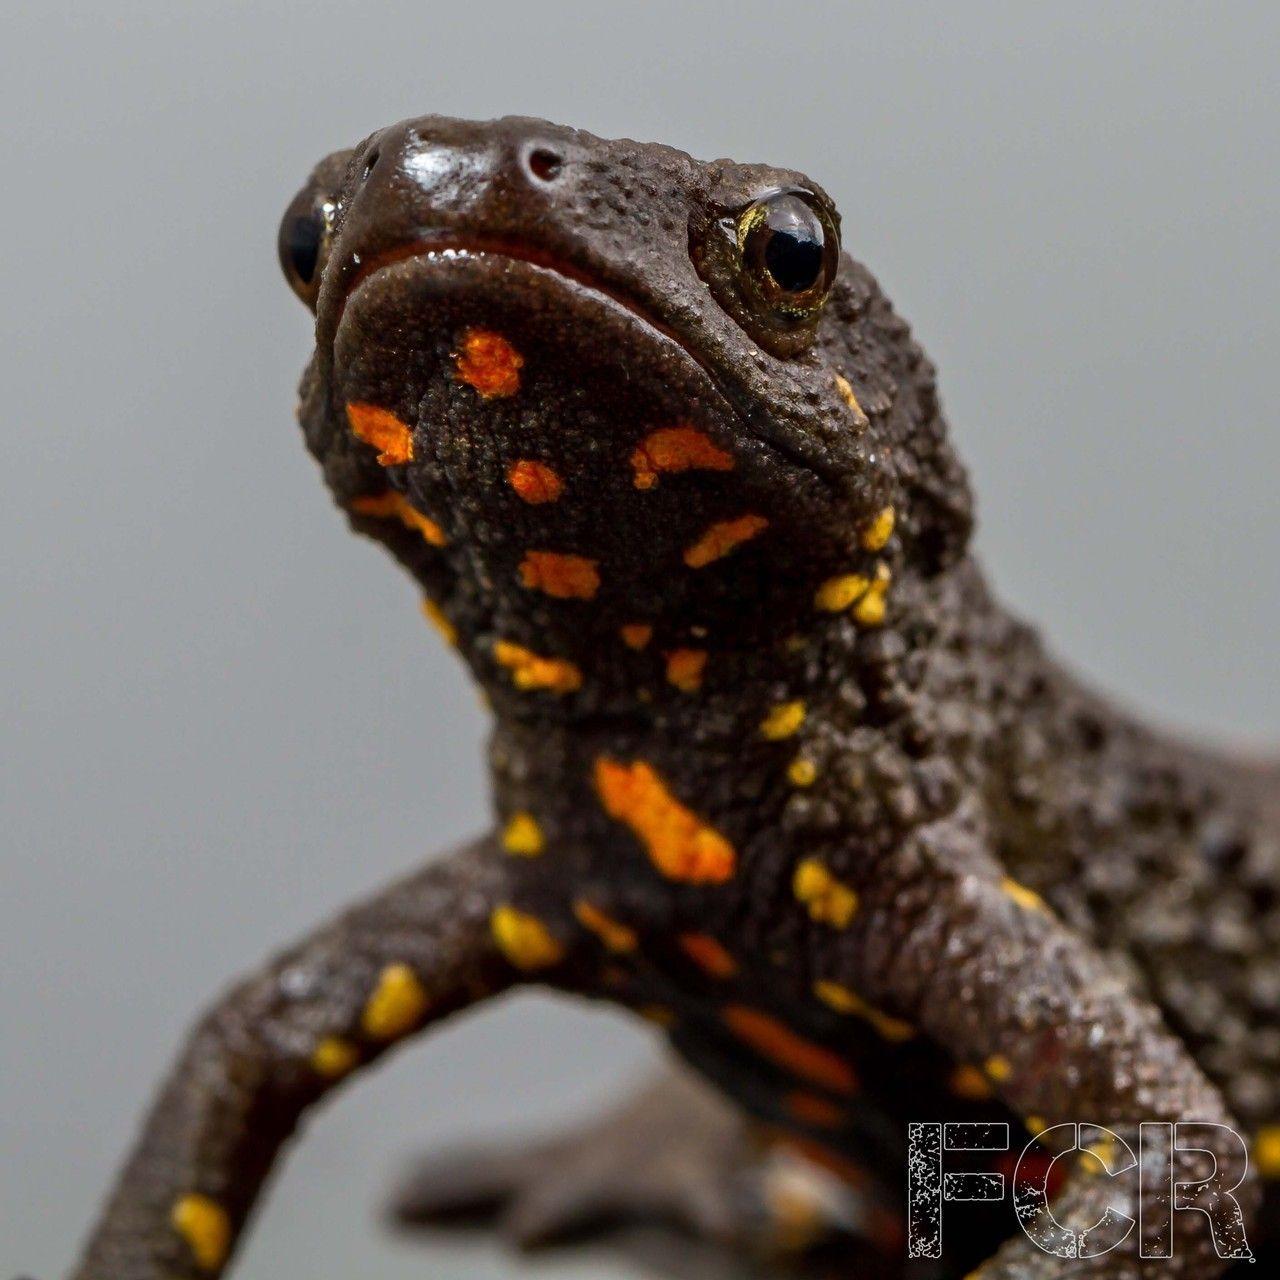 Chinese Warty Newts Newt, Amphibians, Salamander